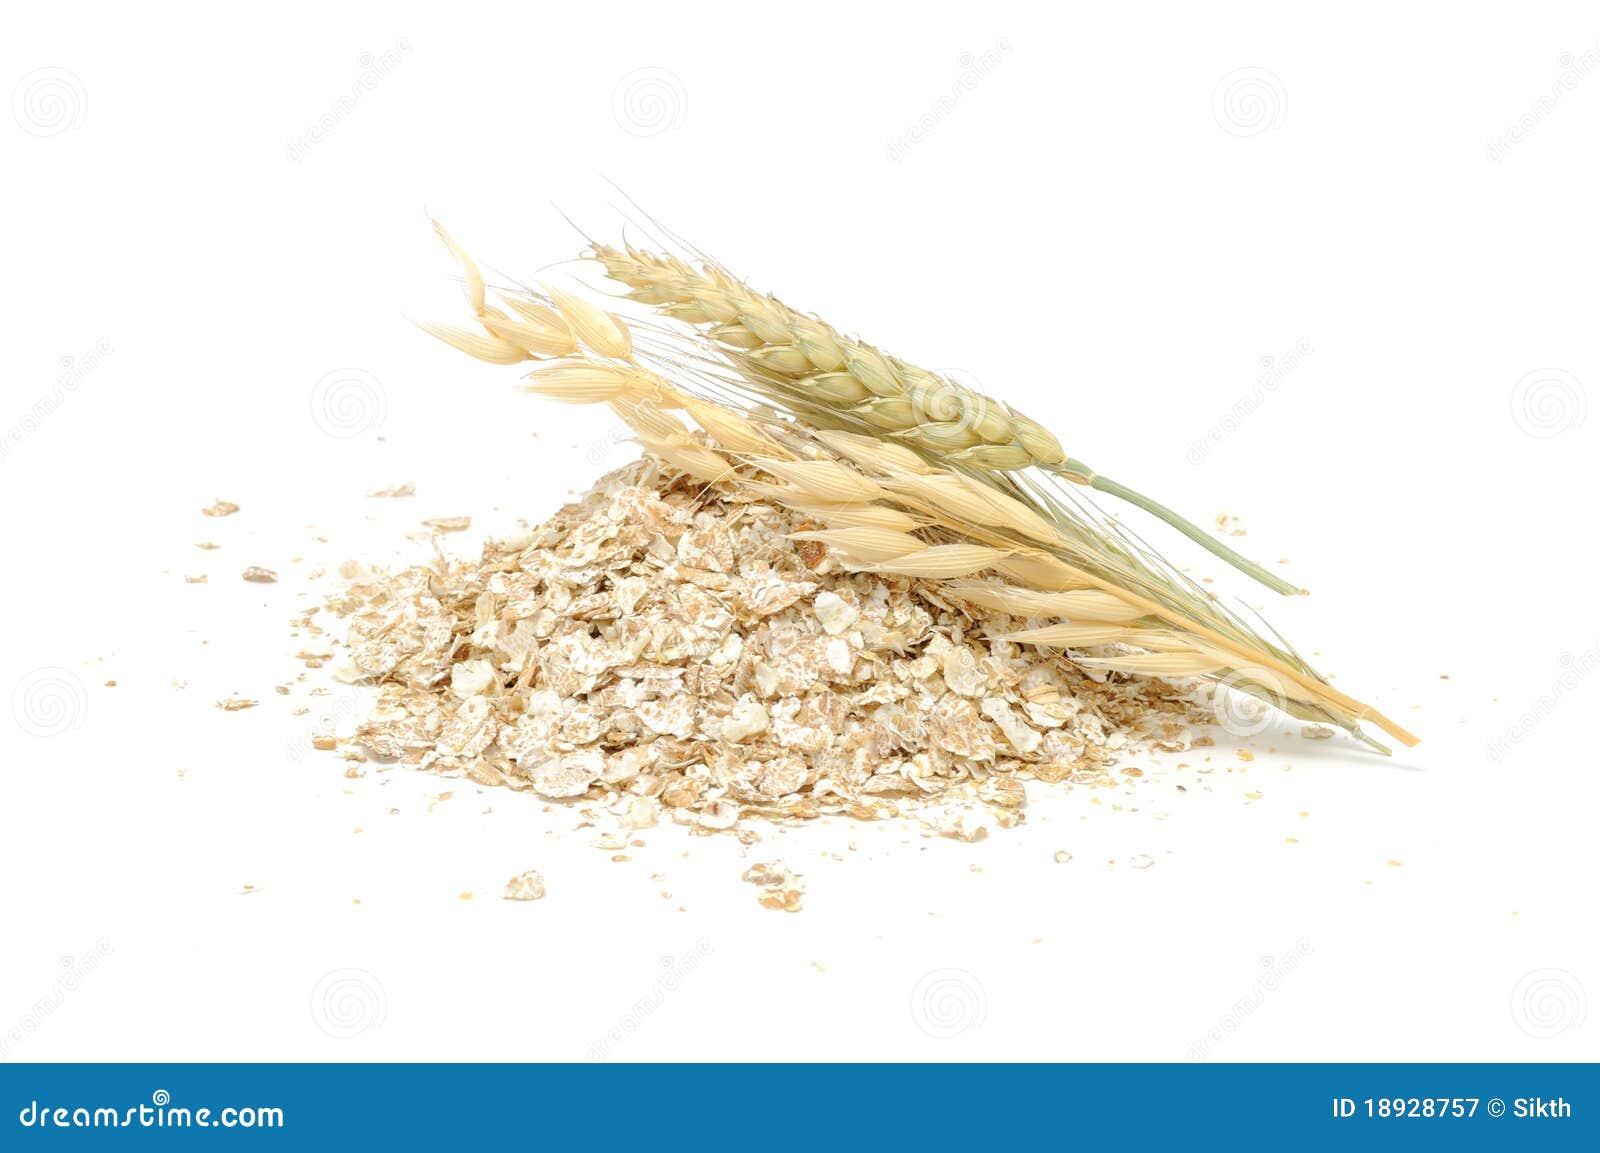 Wheat, Oat, Rye And Barley Flakes with Ears